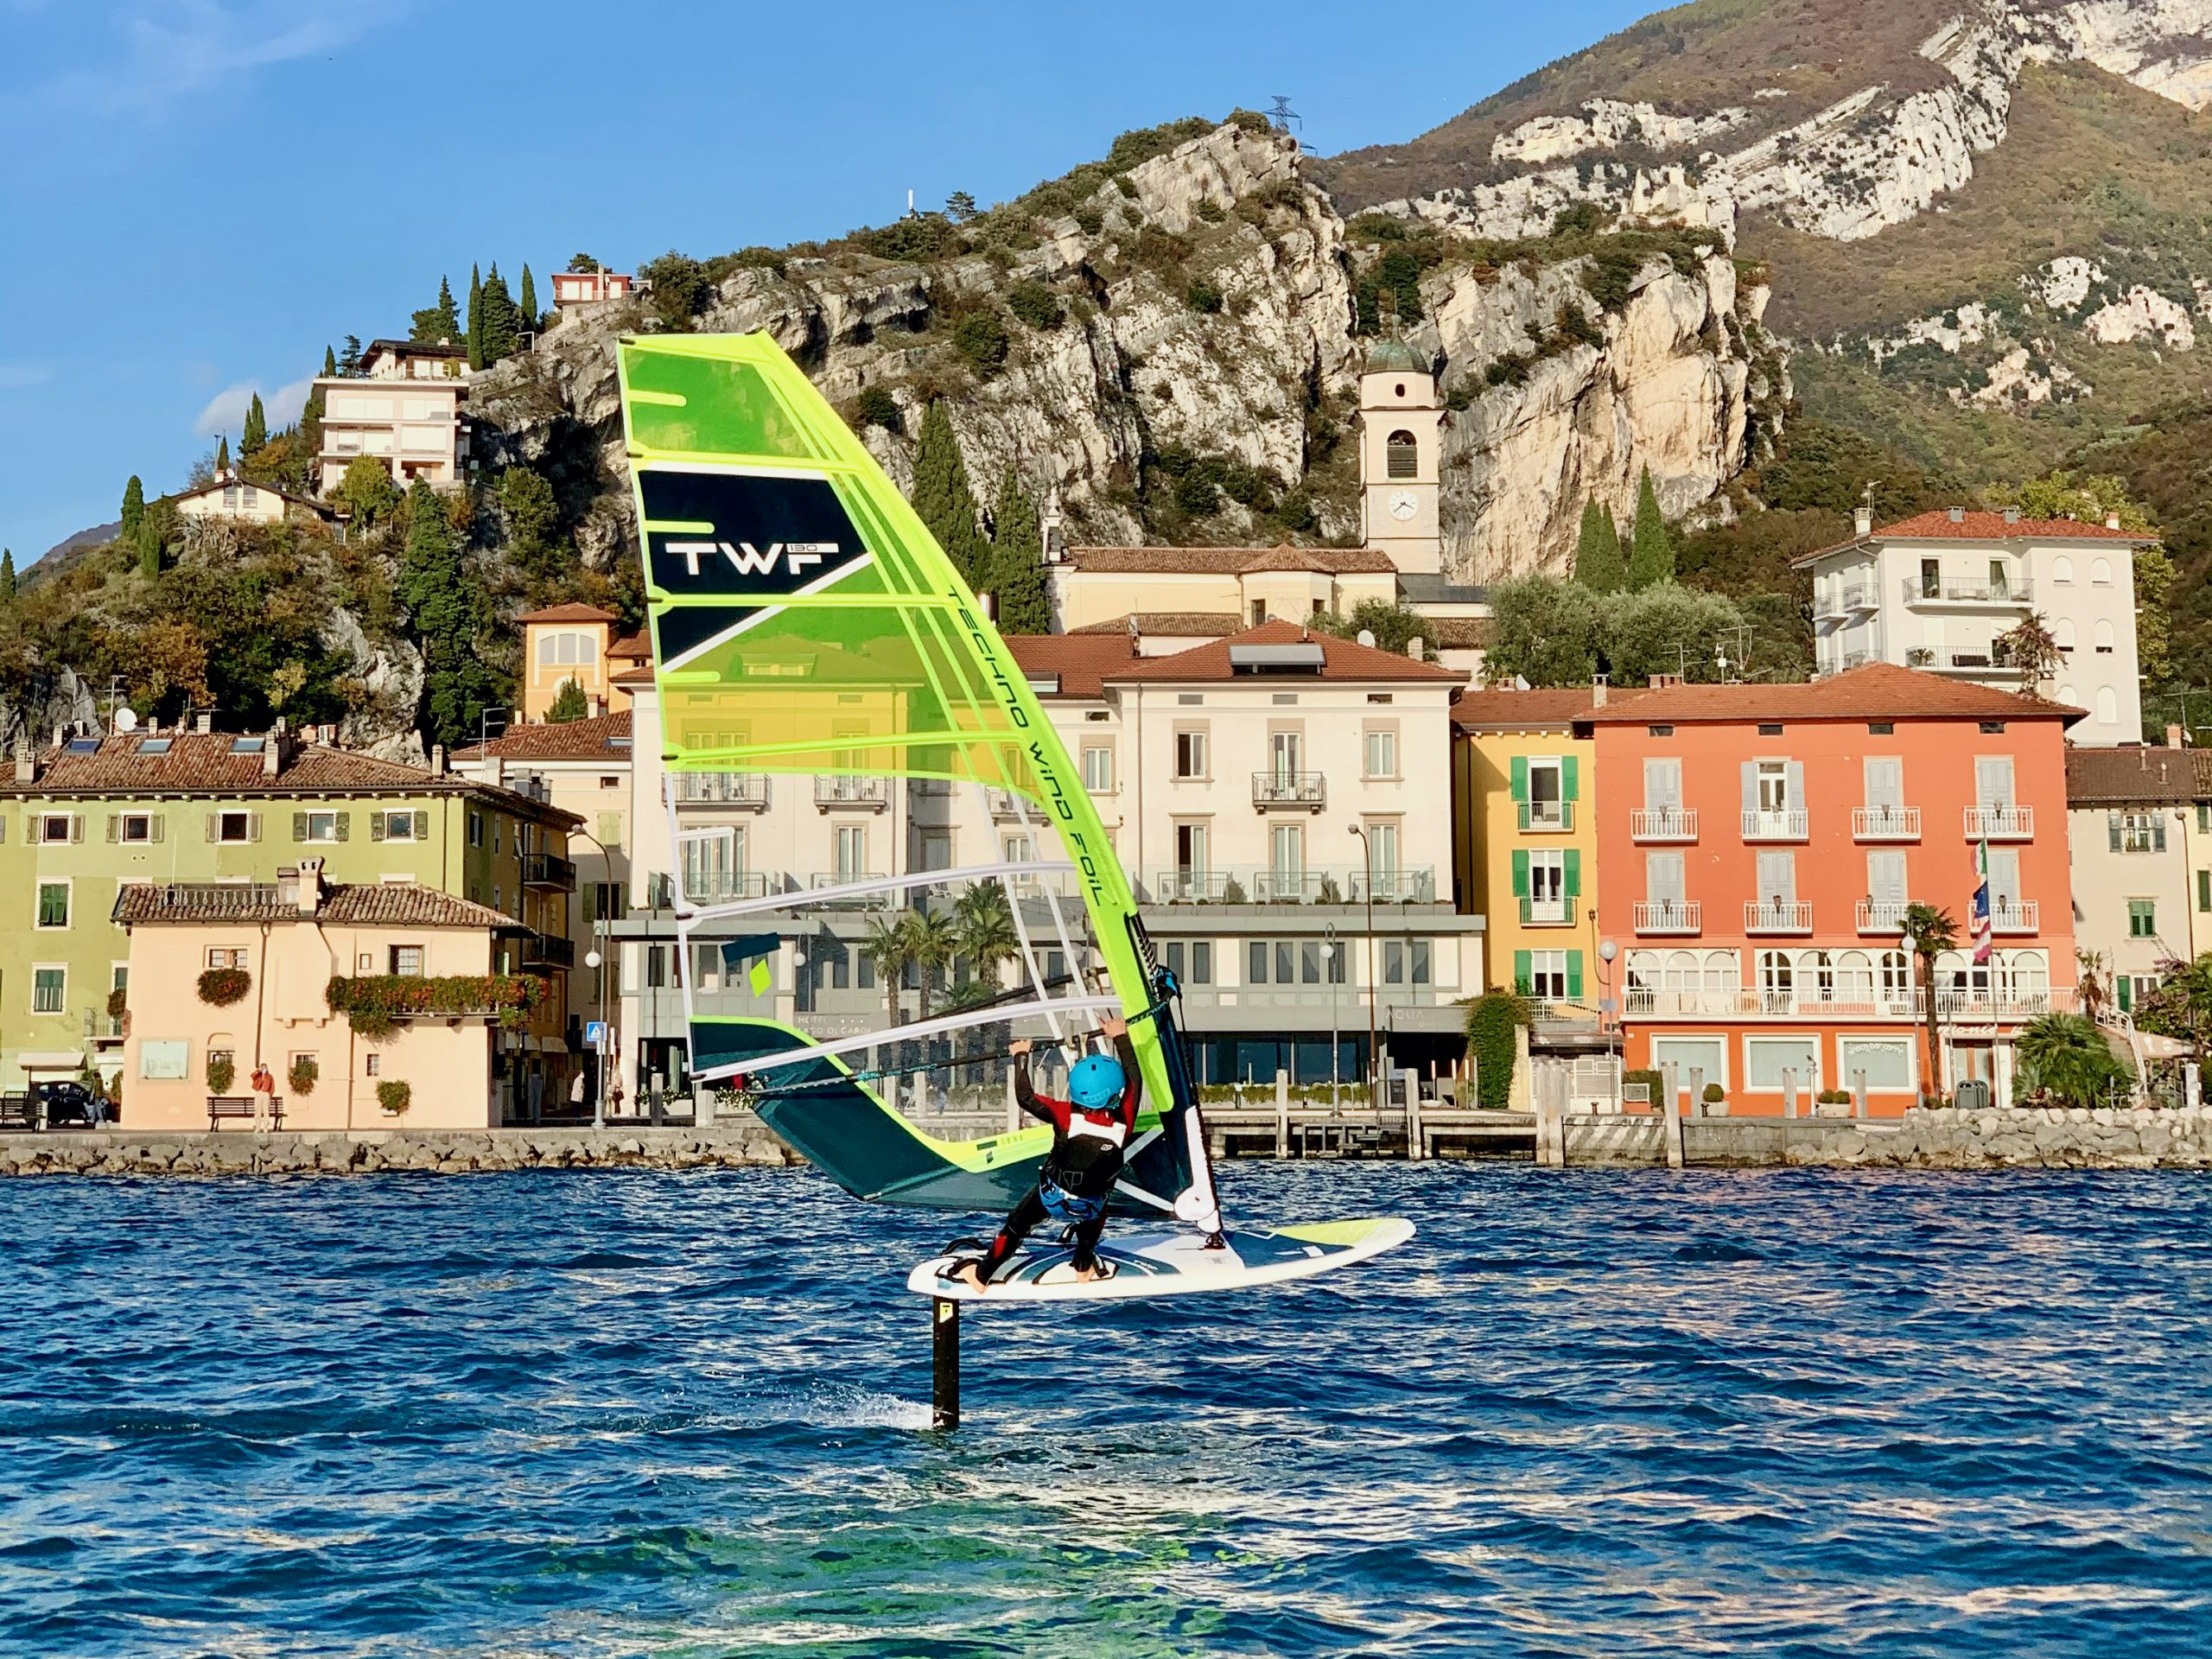 Torbole 293 International Windsurfing Event